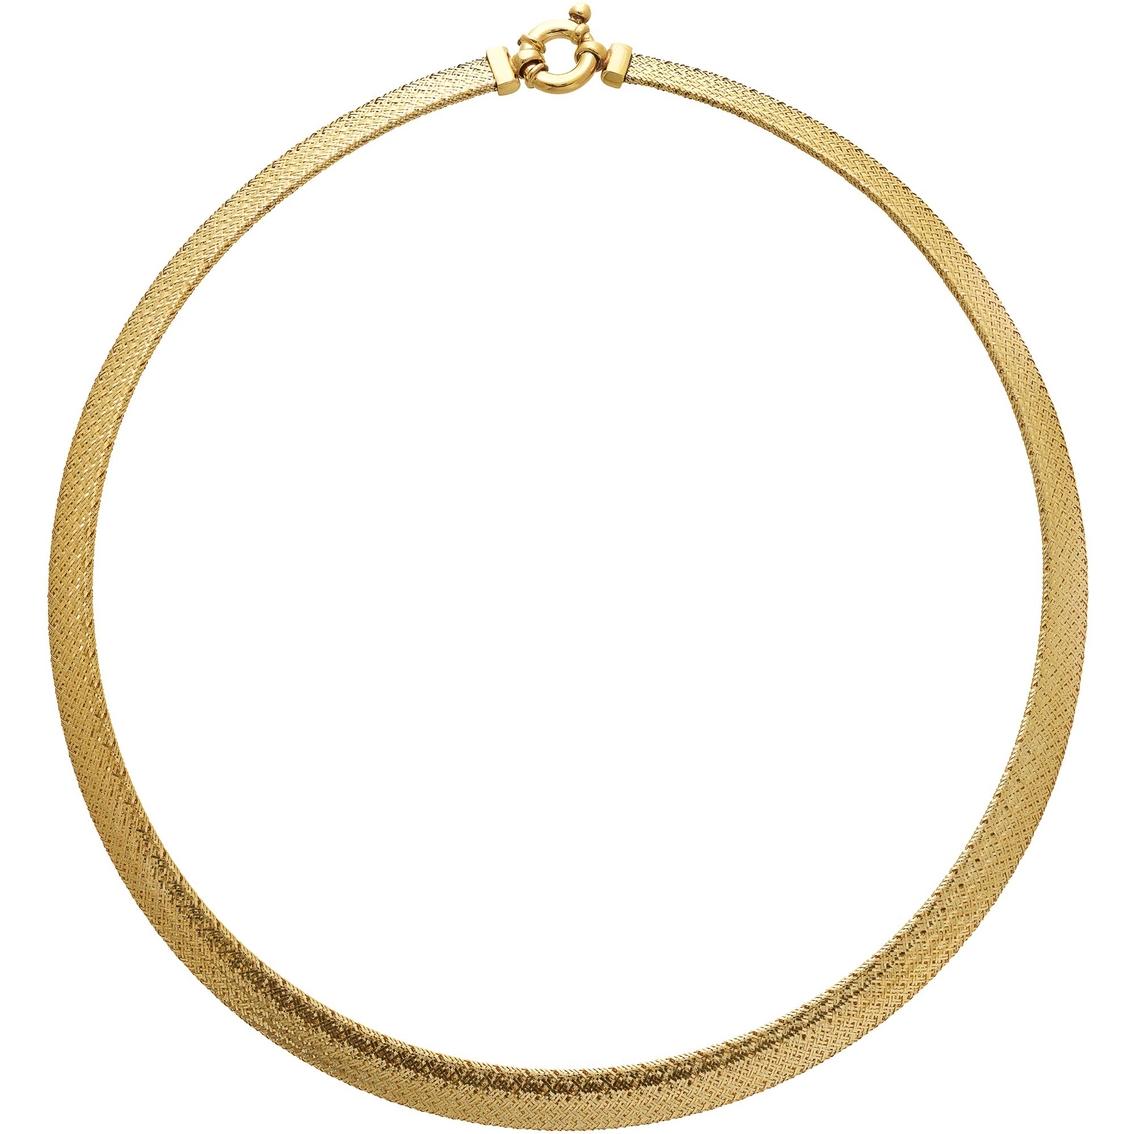 700333d0bd01d 14k Yellow Gold Dome Mesh Omega Necklace | Gold Necklaces & Pendants ...